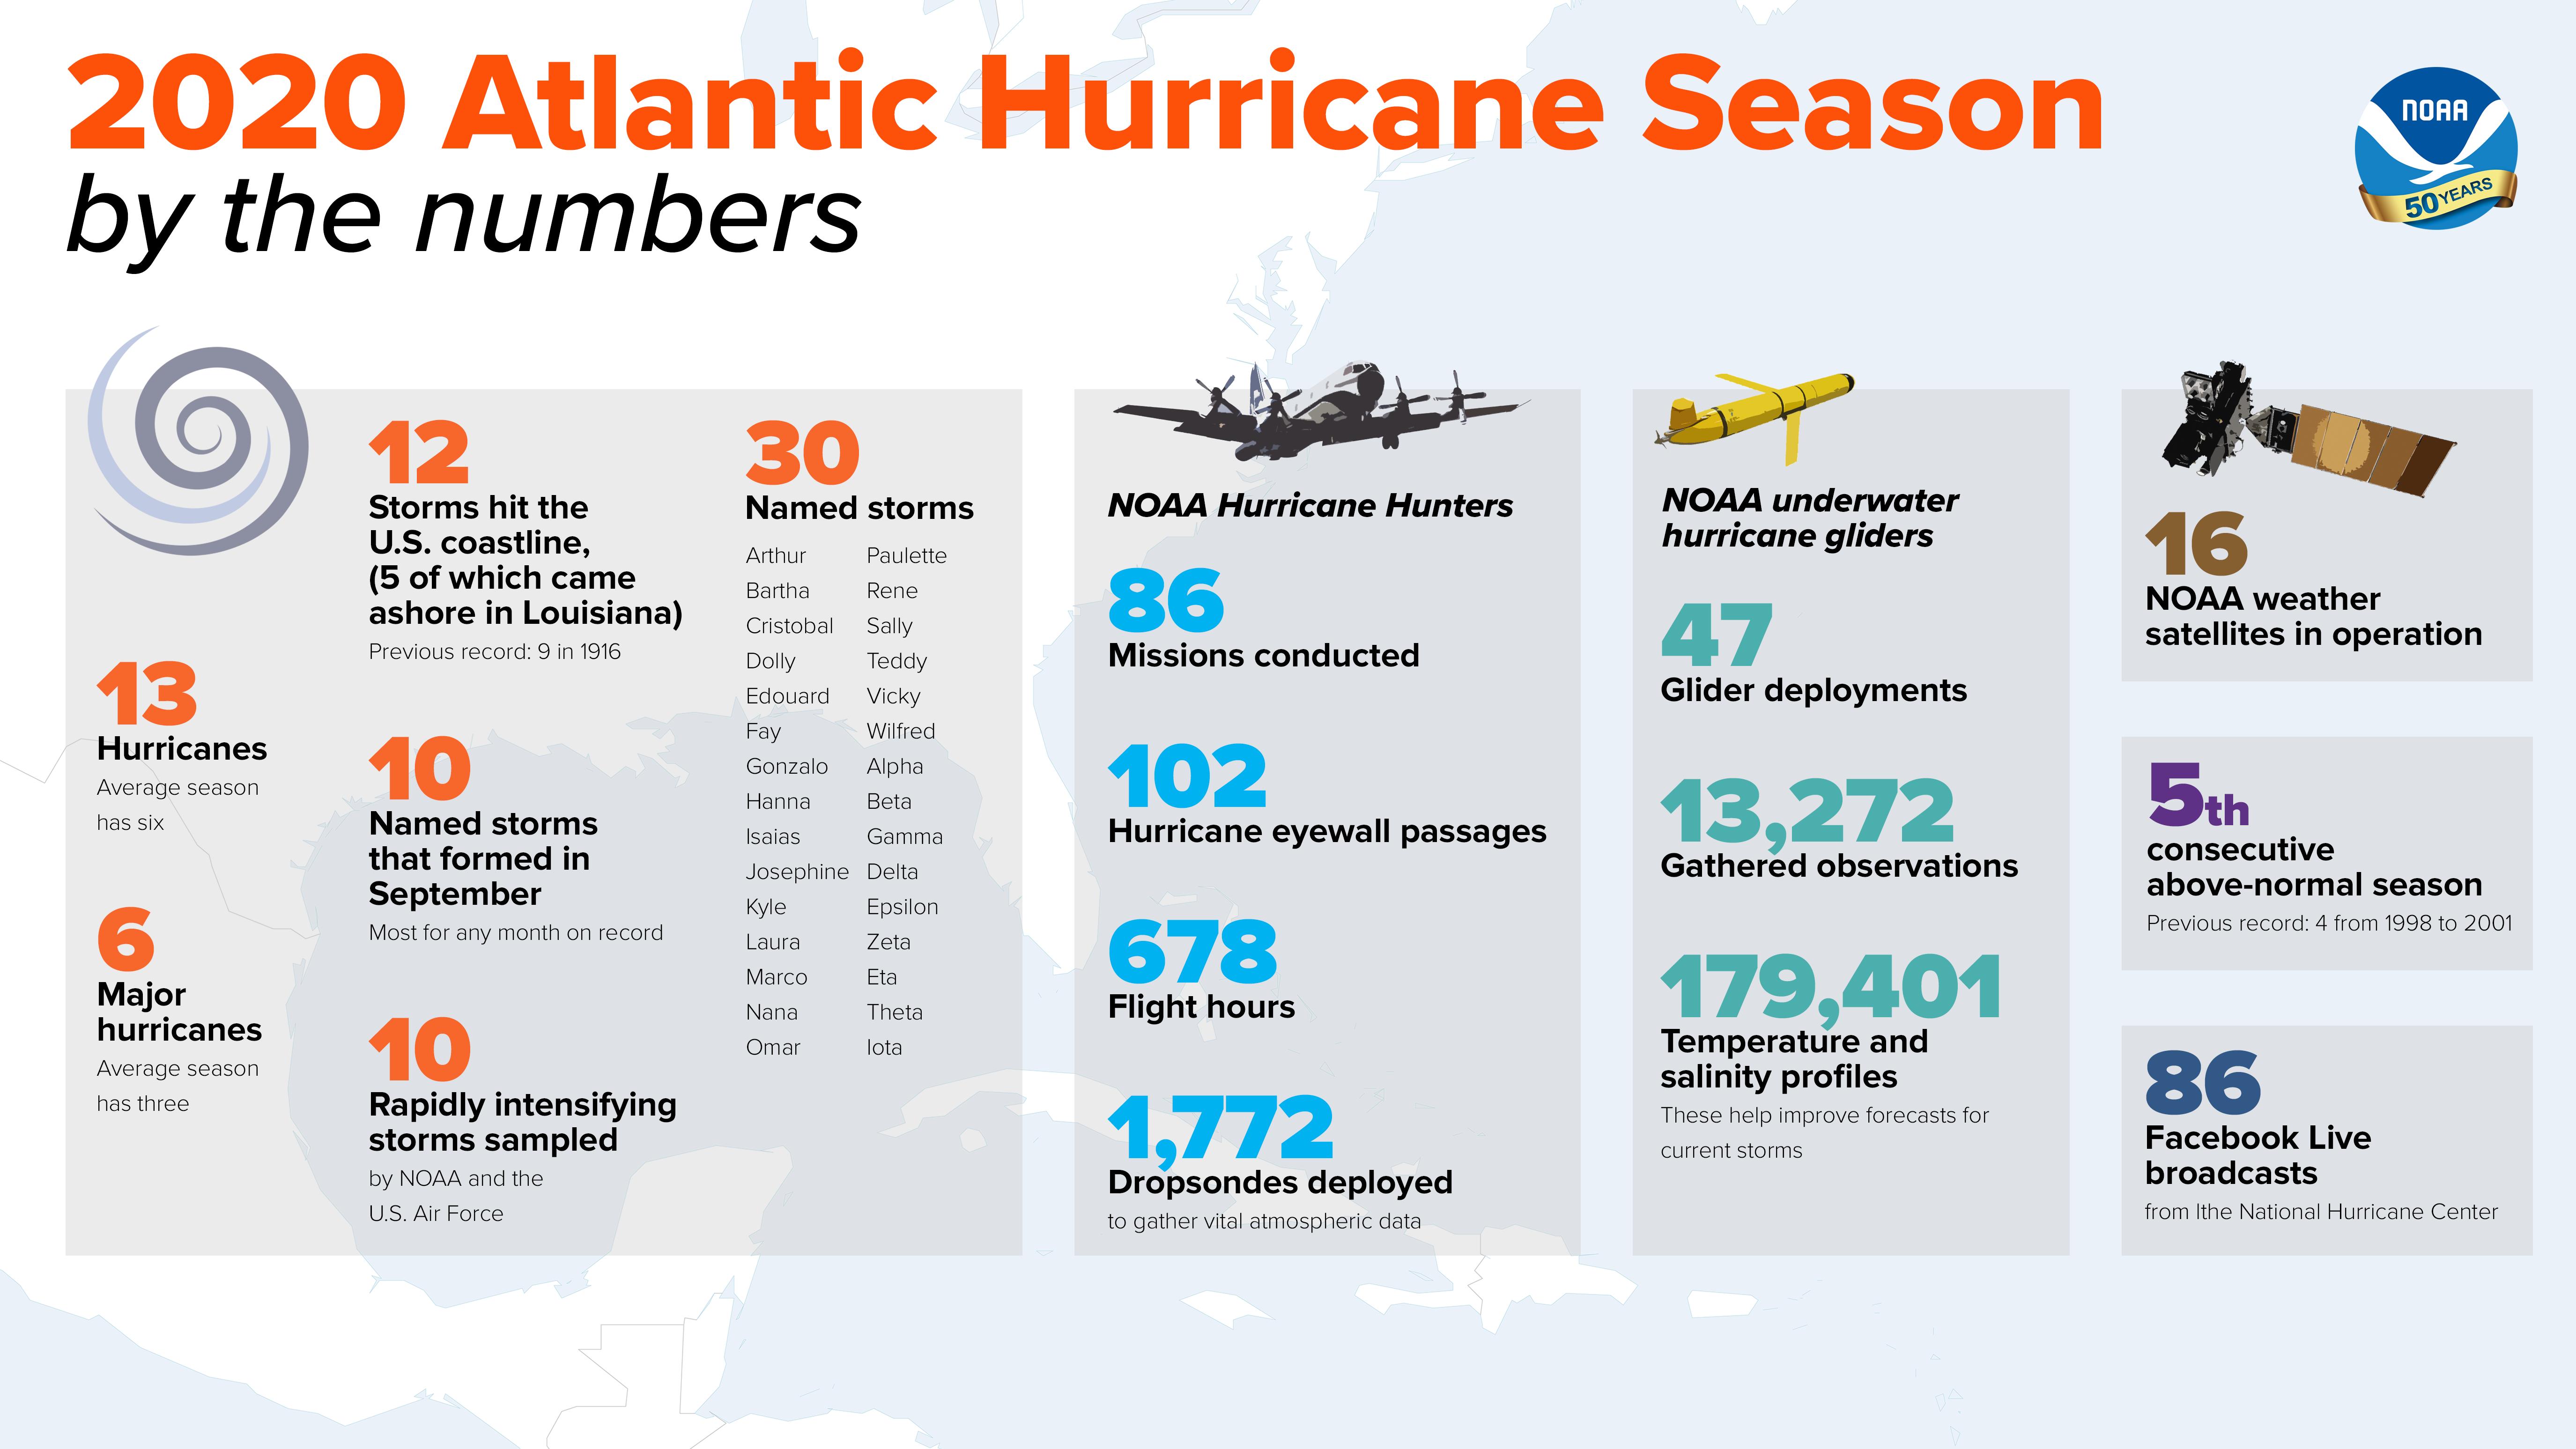 2020-Atlantic-Hurricane-Season  By The Numbers_ 2_FINAL